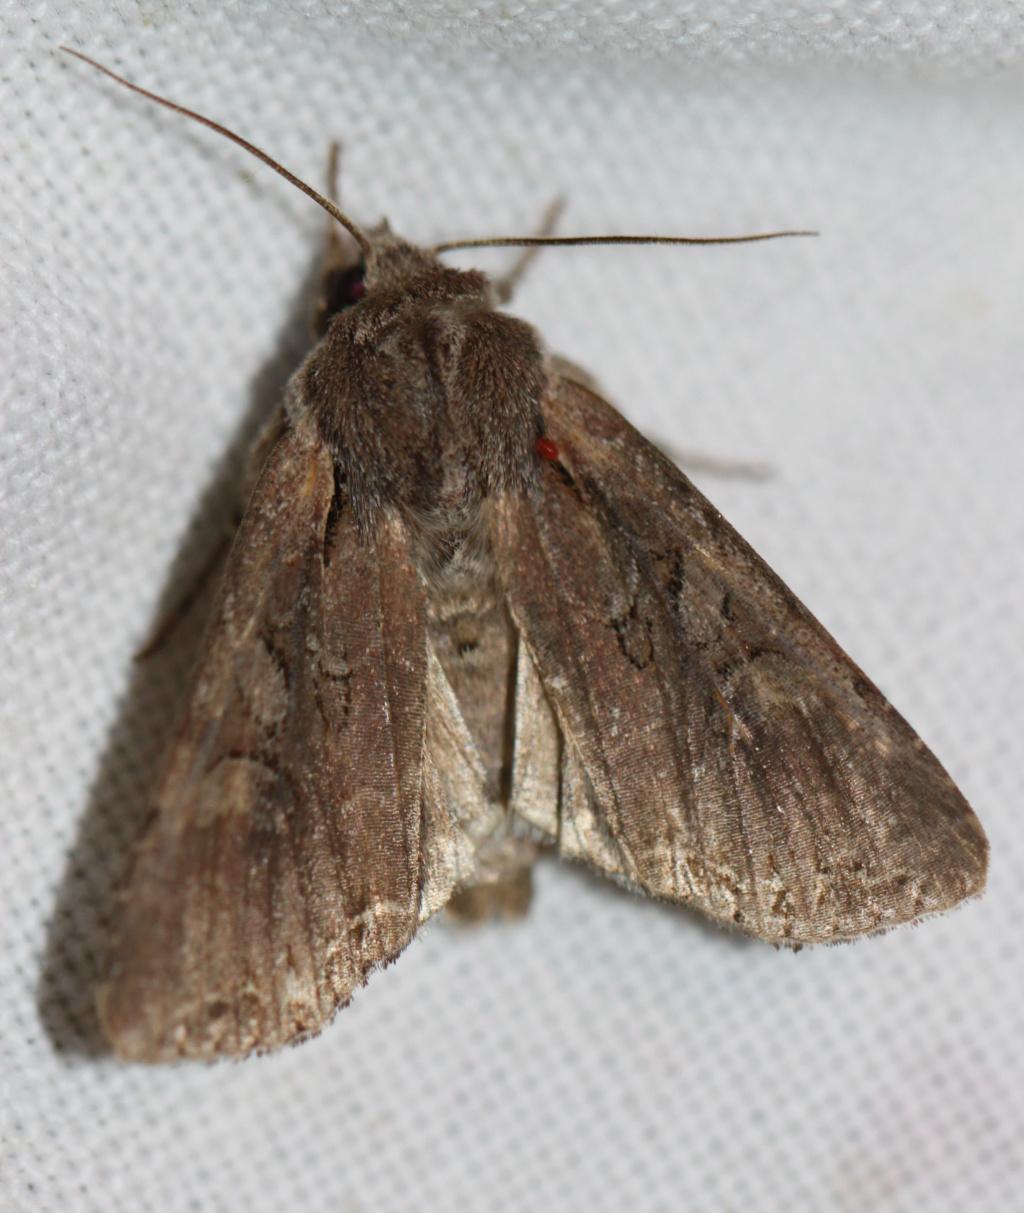 [Lacanobia suasa] Noctuelle marron à identifier  Img_0513